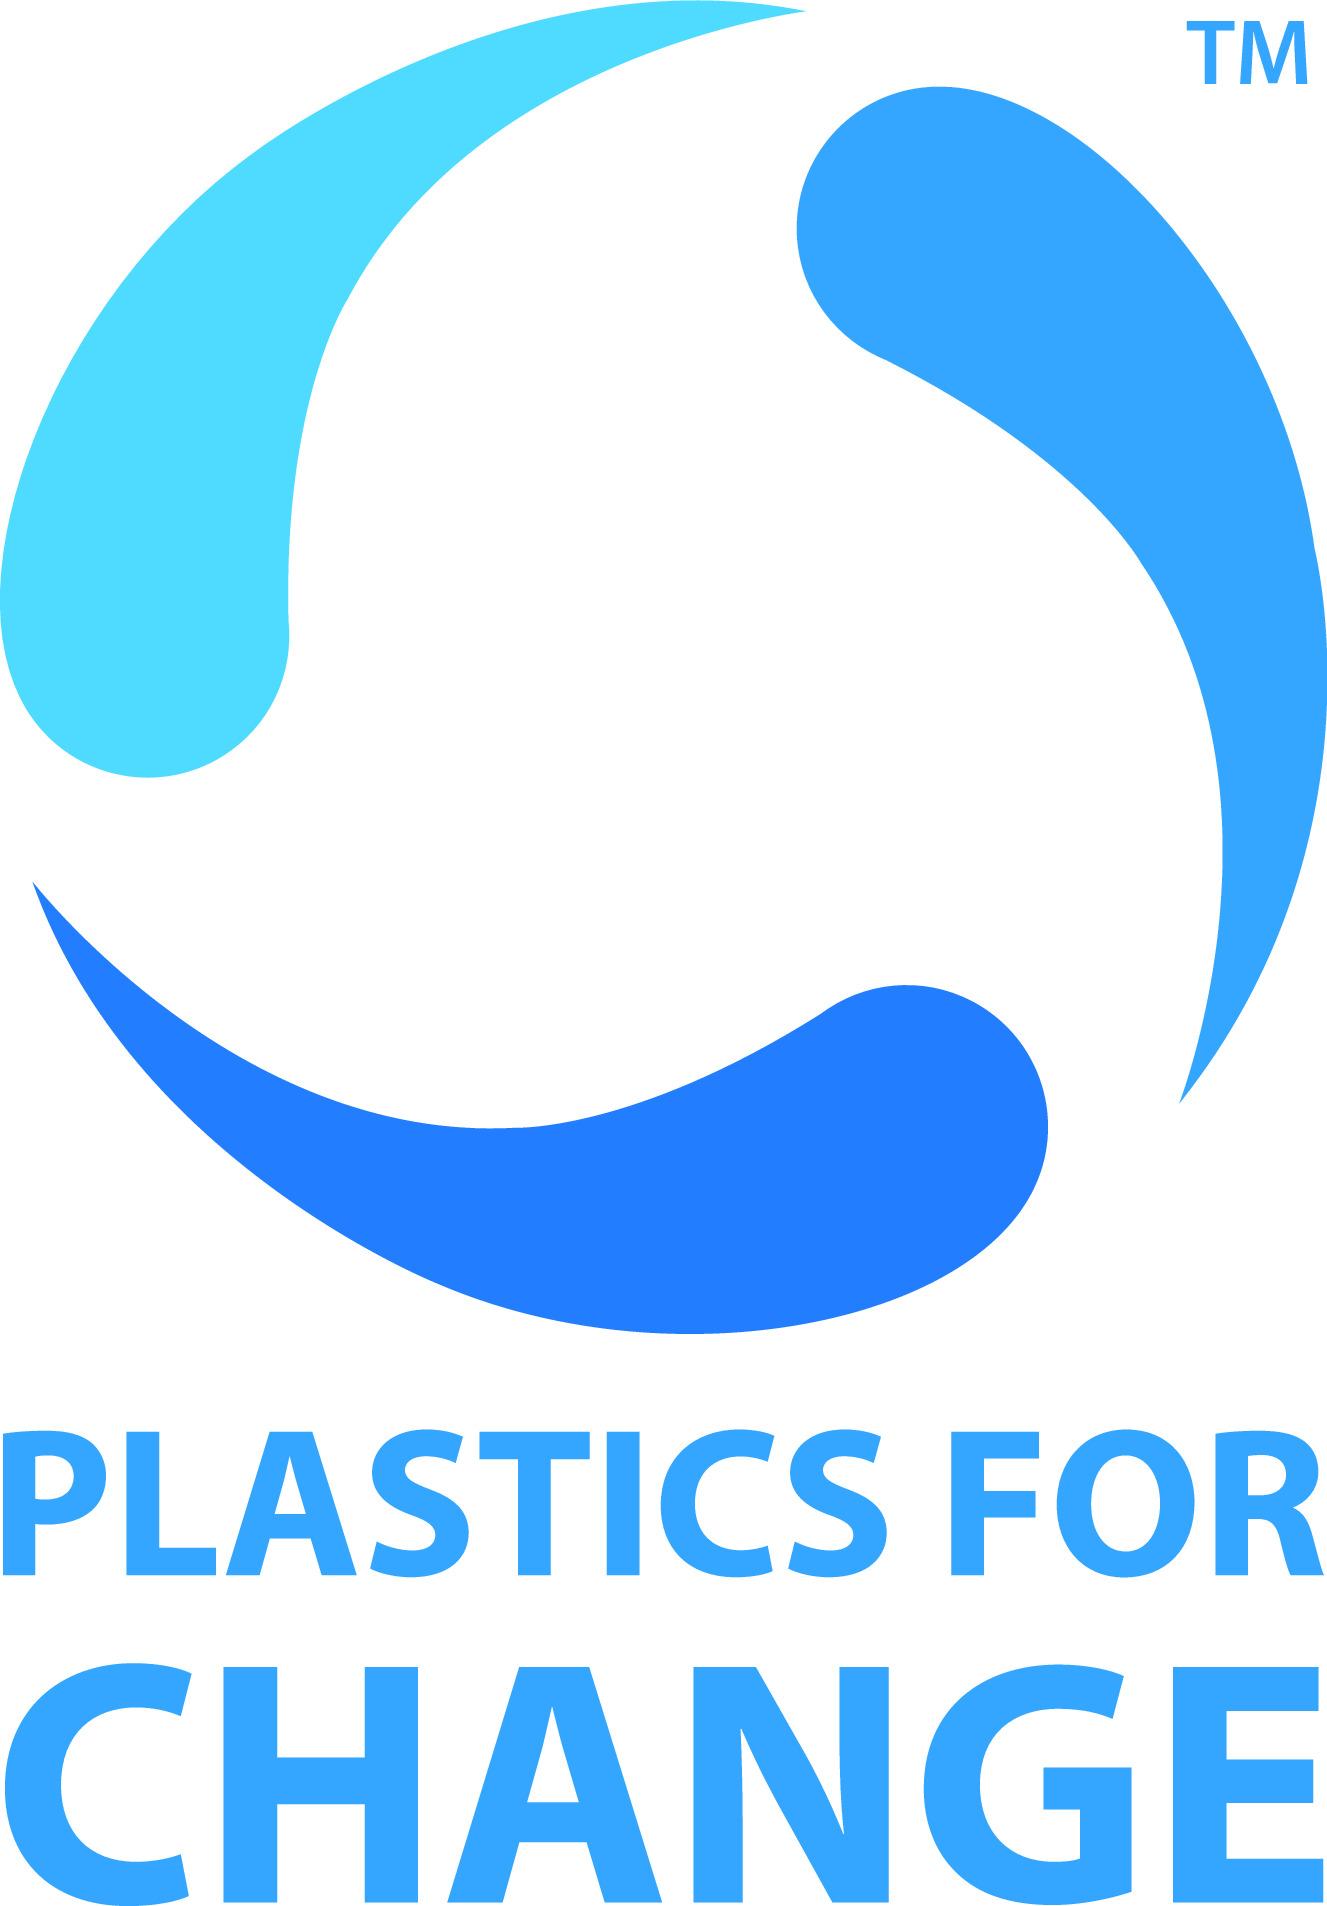 https://europeanplasticspact.org/wp-content/uploads/2021/05/plastics-for-change-logo_eps.jpg